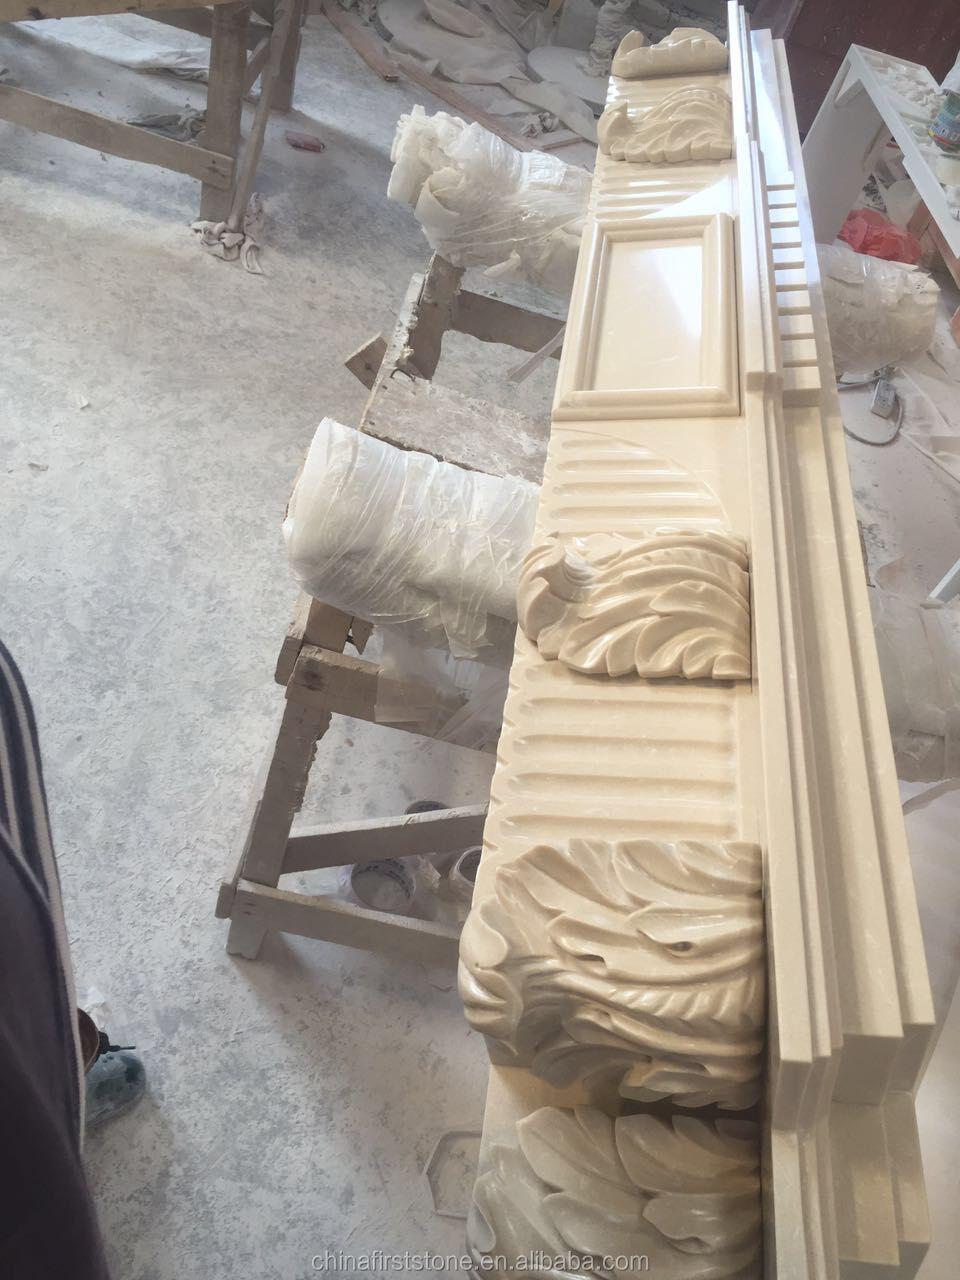 MFI122 beyaz mermer taş lüks Modern dekoratif elektrikli şömine